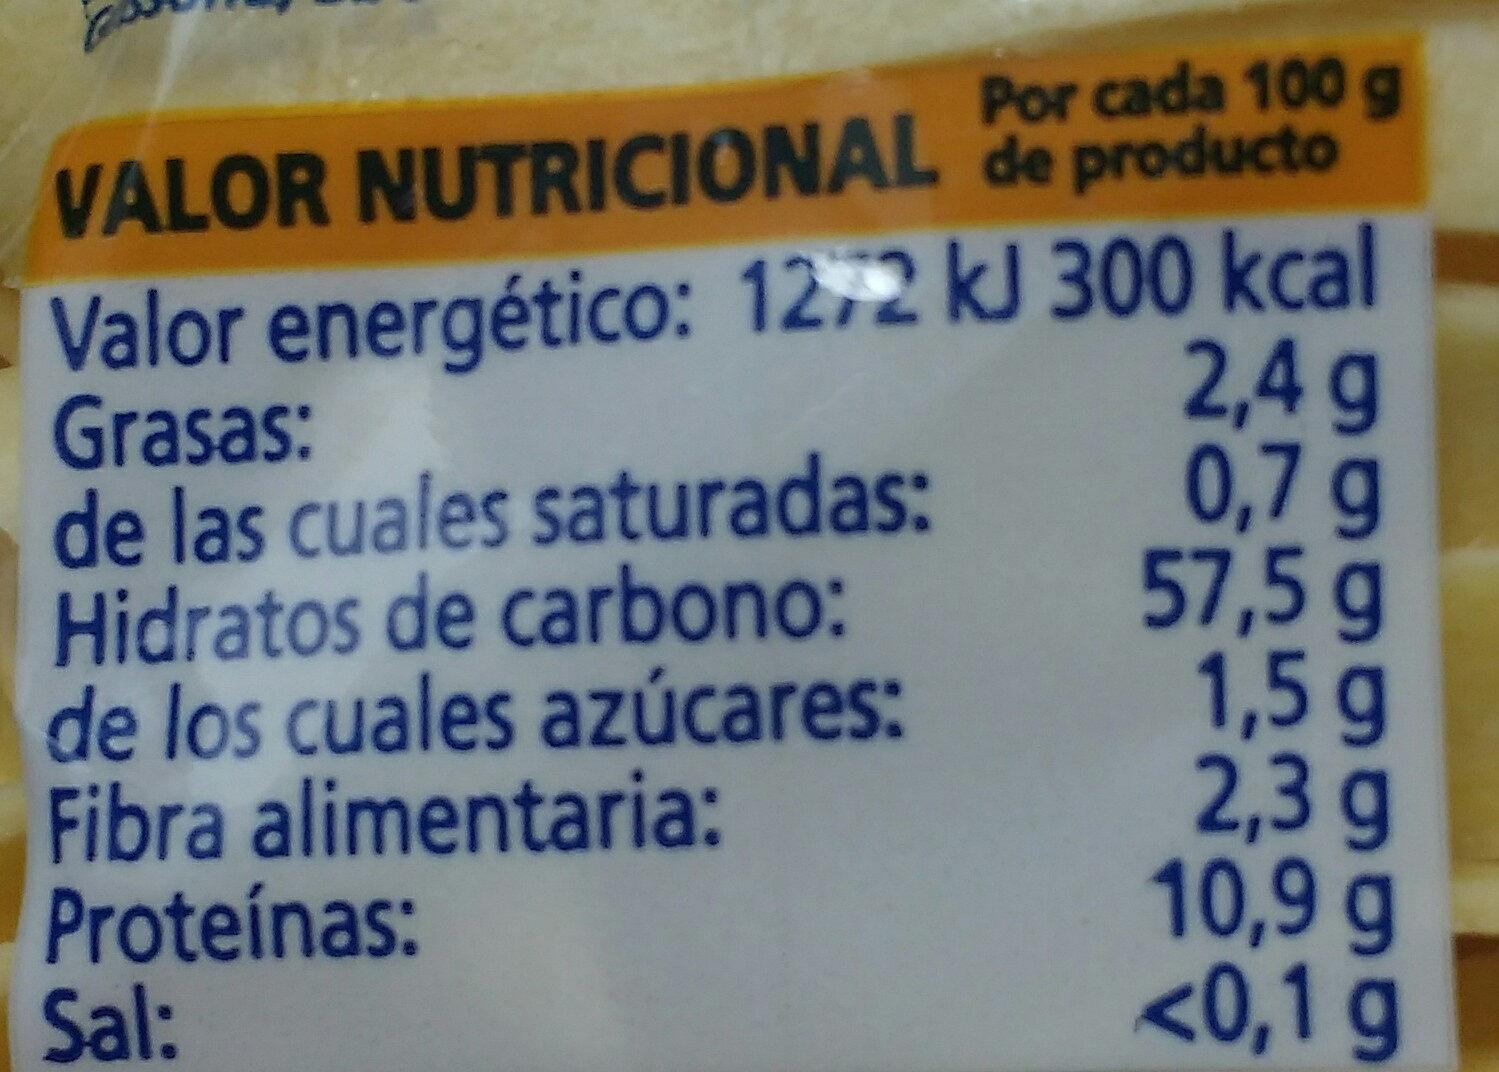 Tagliatelle al huevo - Informations nutritionnelles - es